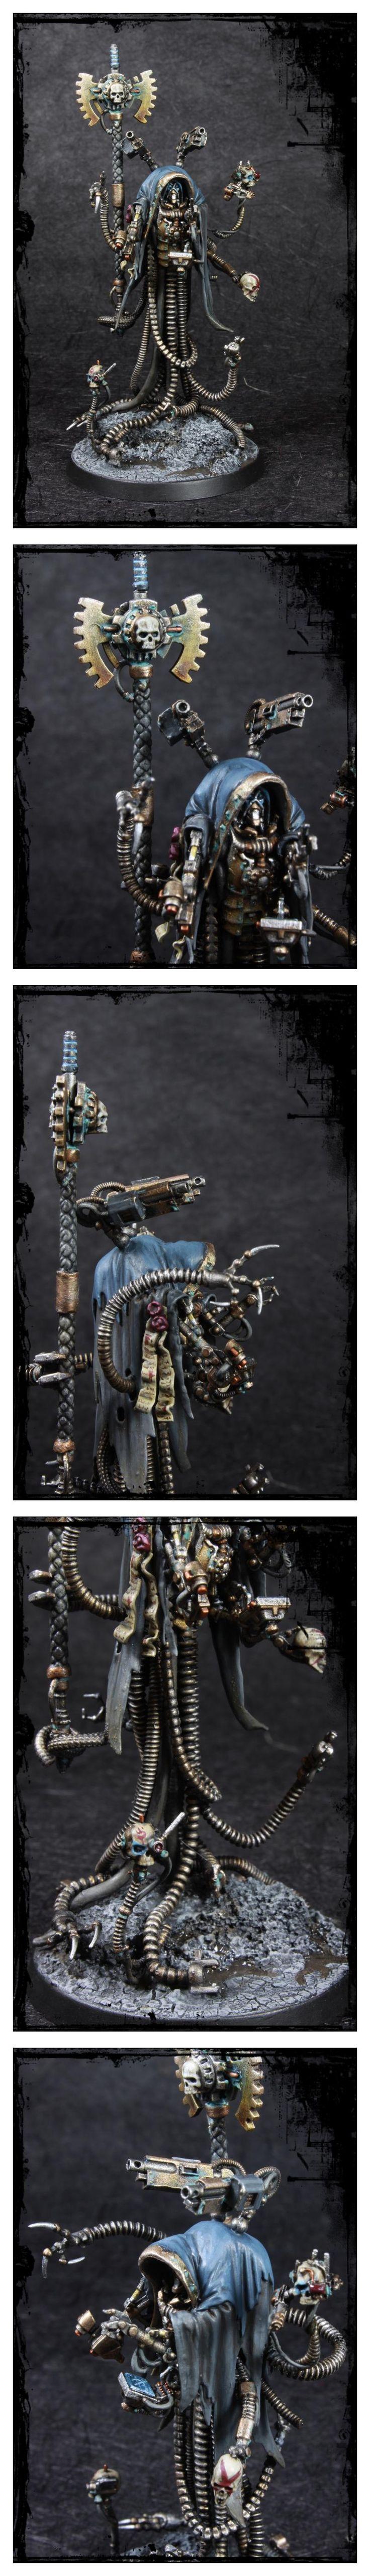 Achlys Iii, Adeptus Mechanicus, Admech, Arch-magos, Warhammer 40,000